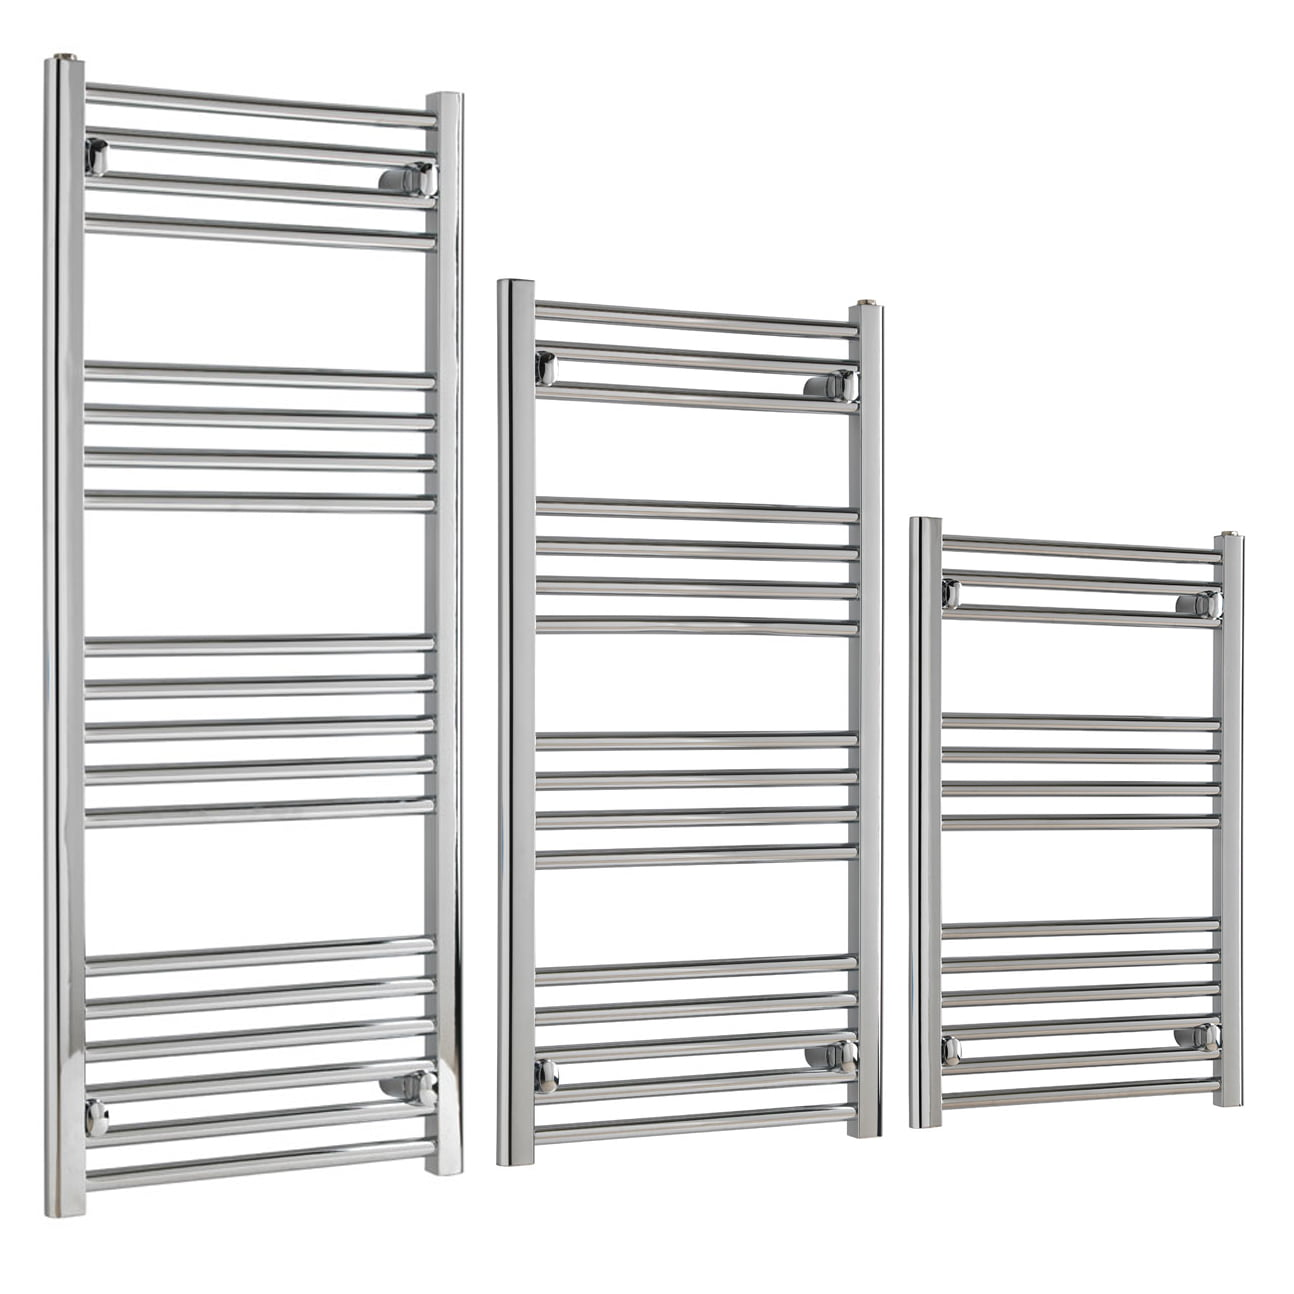 Aura 22 Budget Towel Warmer – Central Heating (Chrome) 4